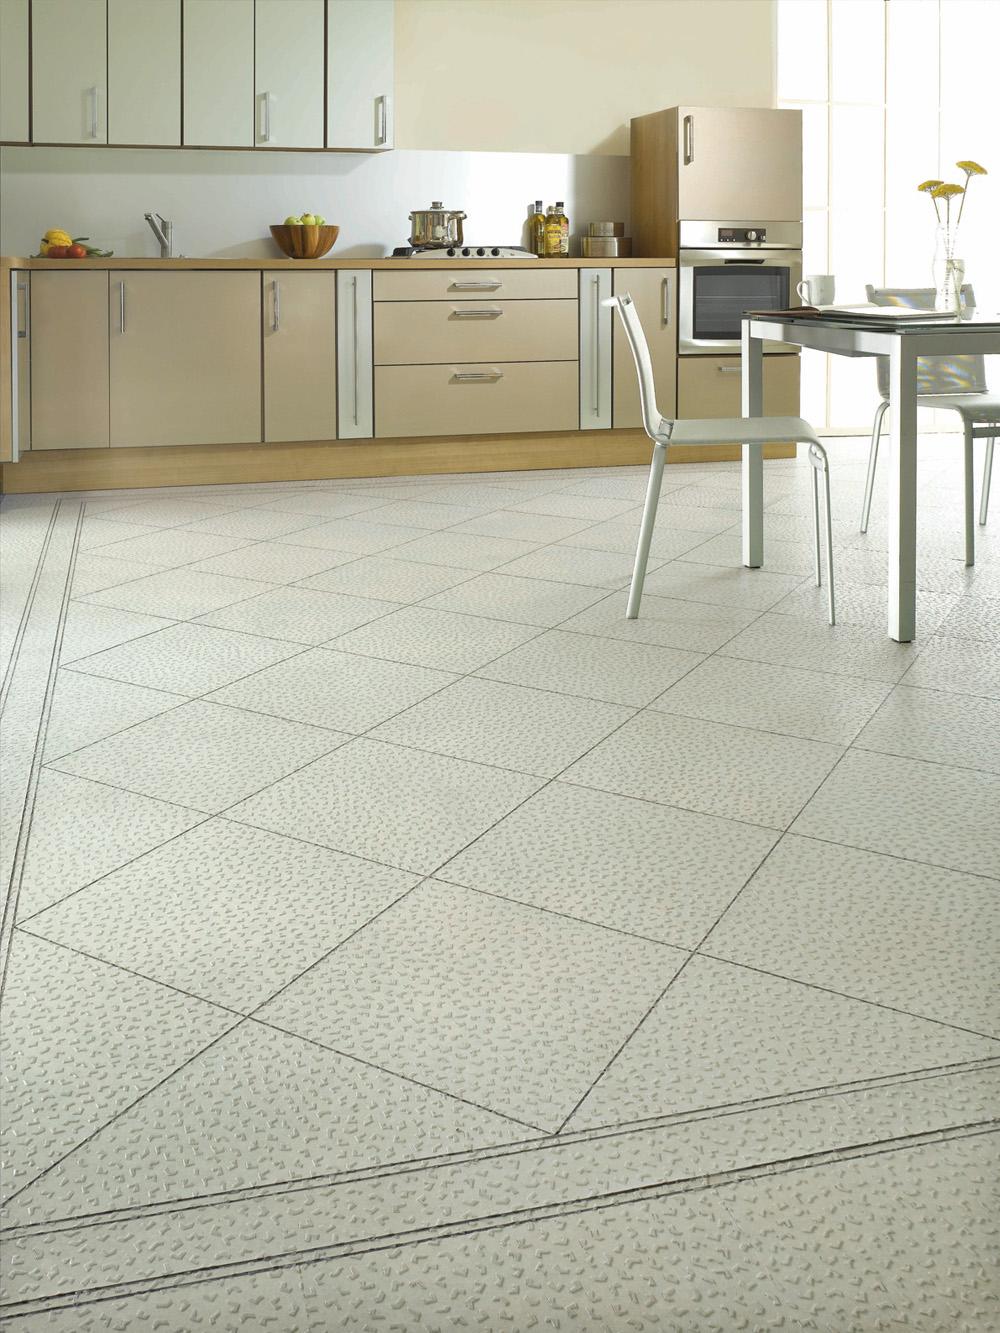 Karndean in kitchens gallery homecraft carpets mlc07 dailygadgetfo Images